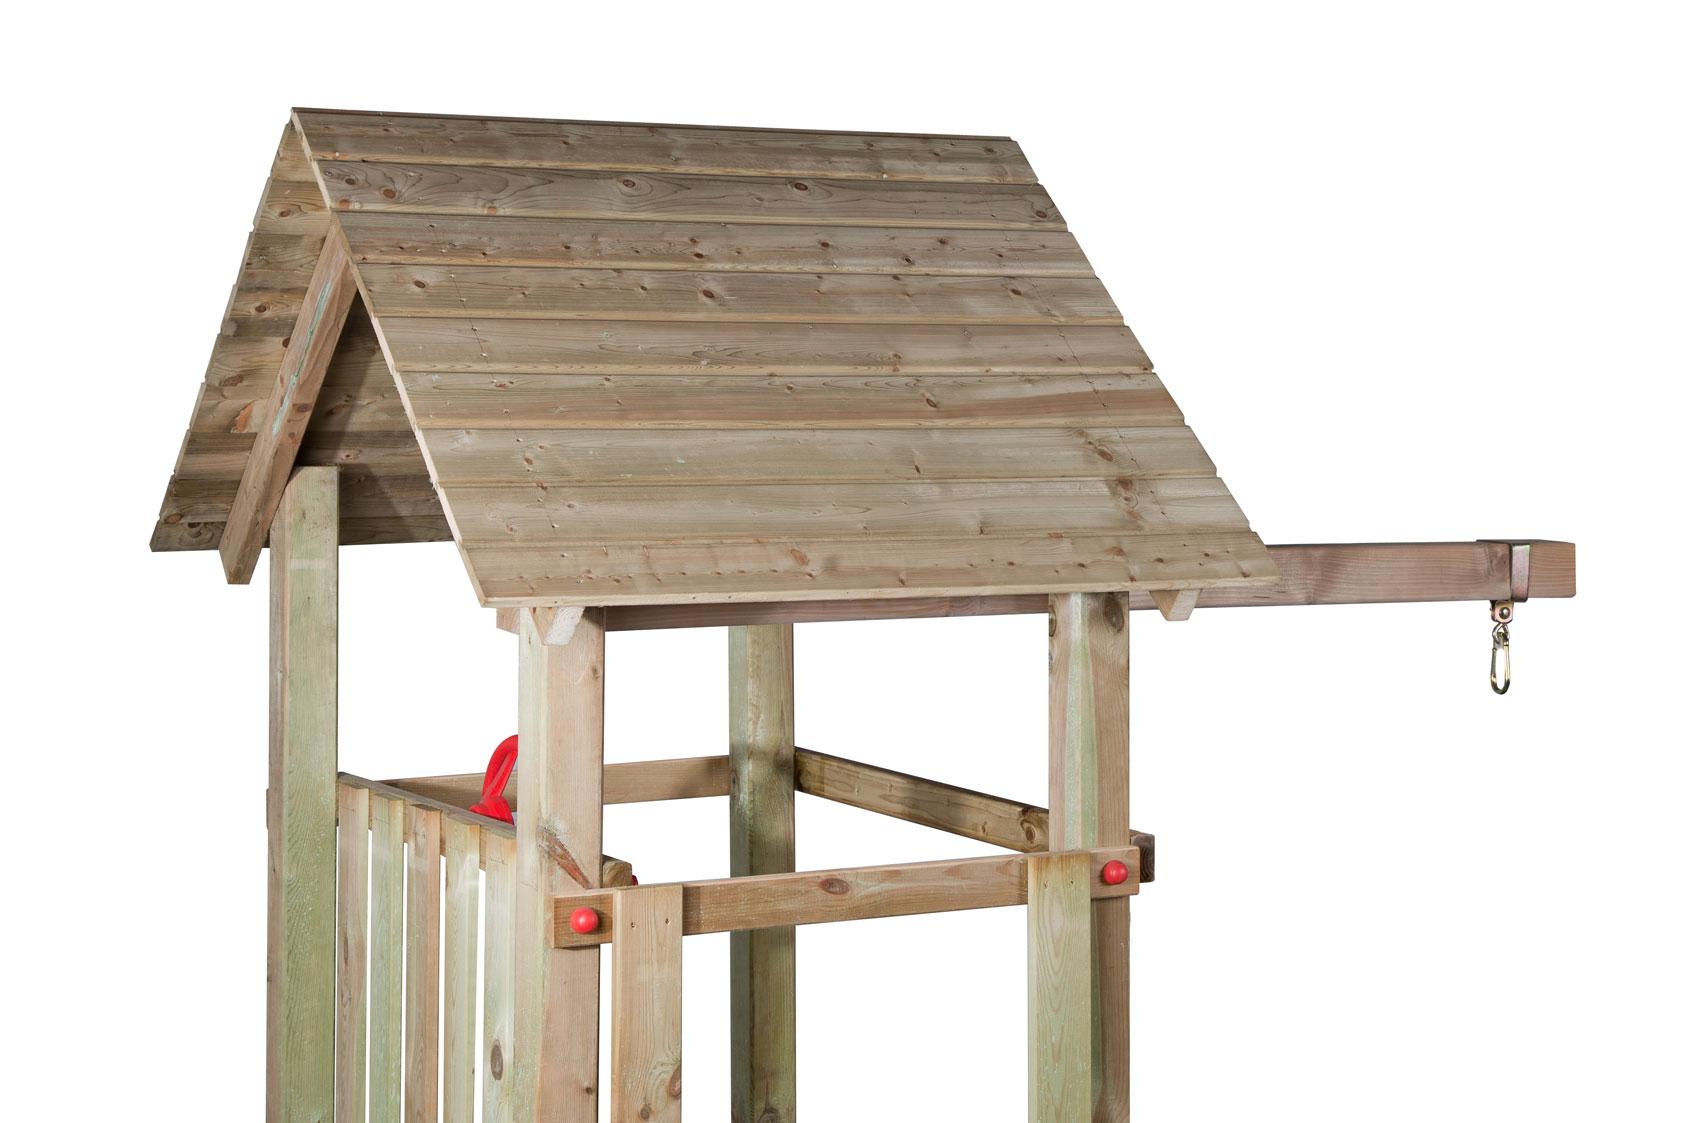 spielturm beauty woodini l kletterturm mit schaukel netz. Black Bedroom Furniture Sets. Home Design Ideas